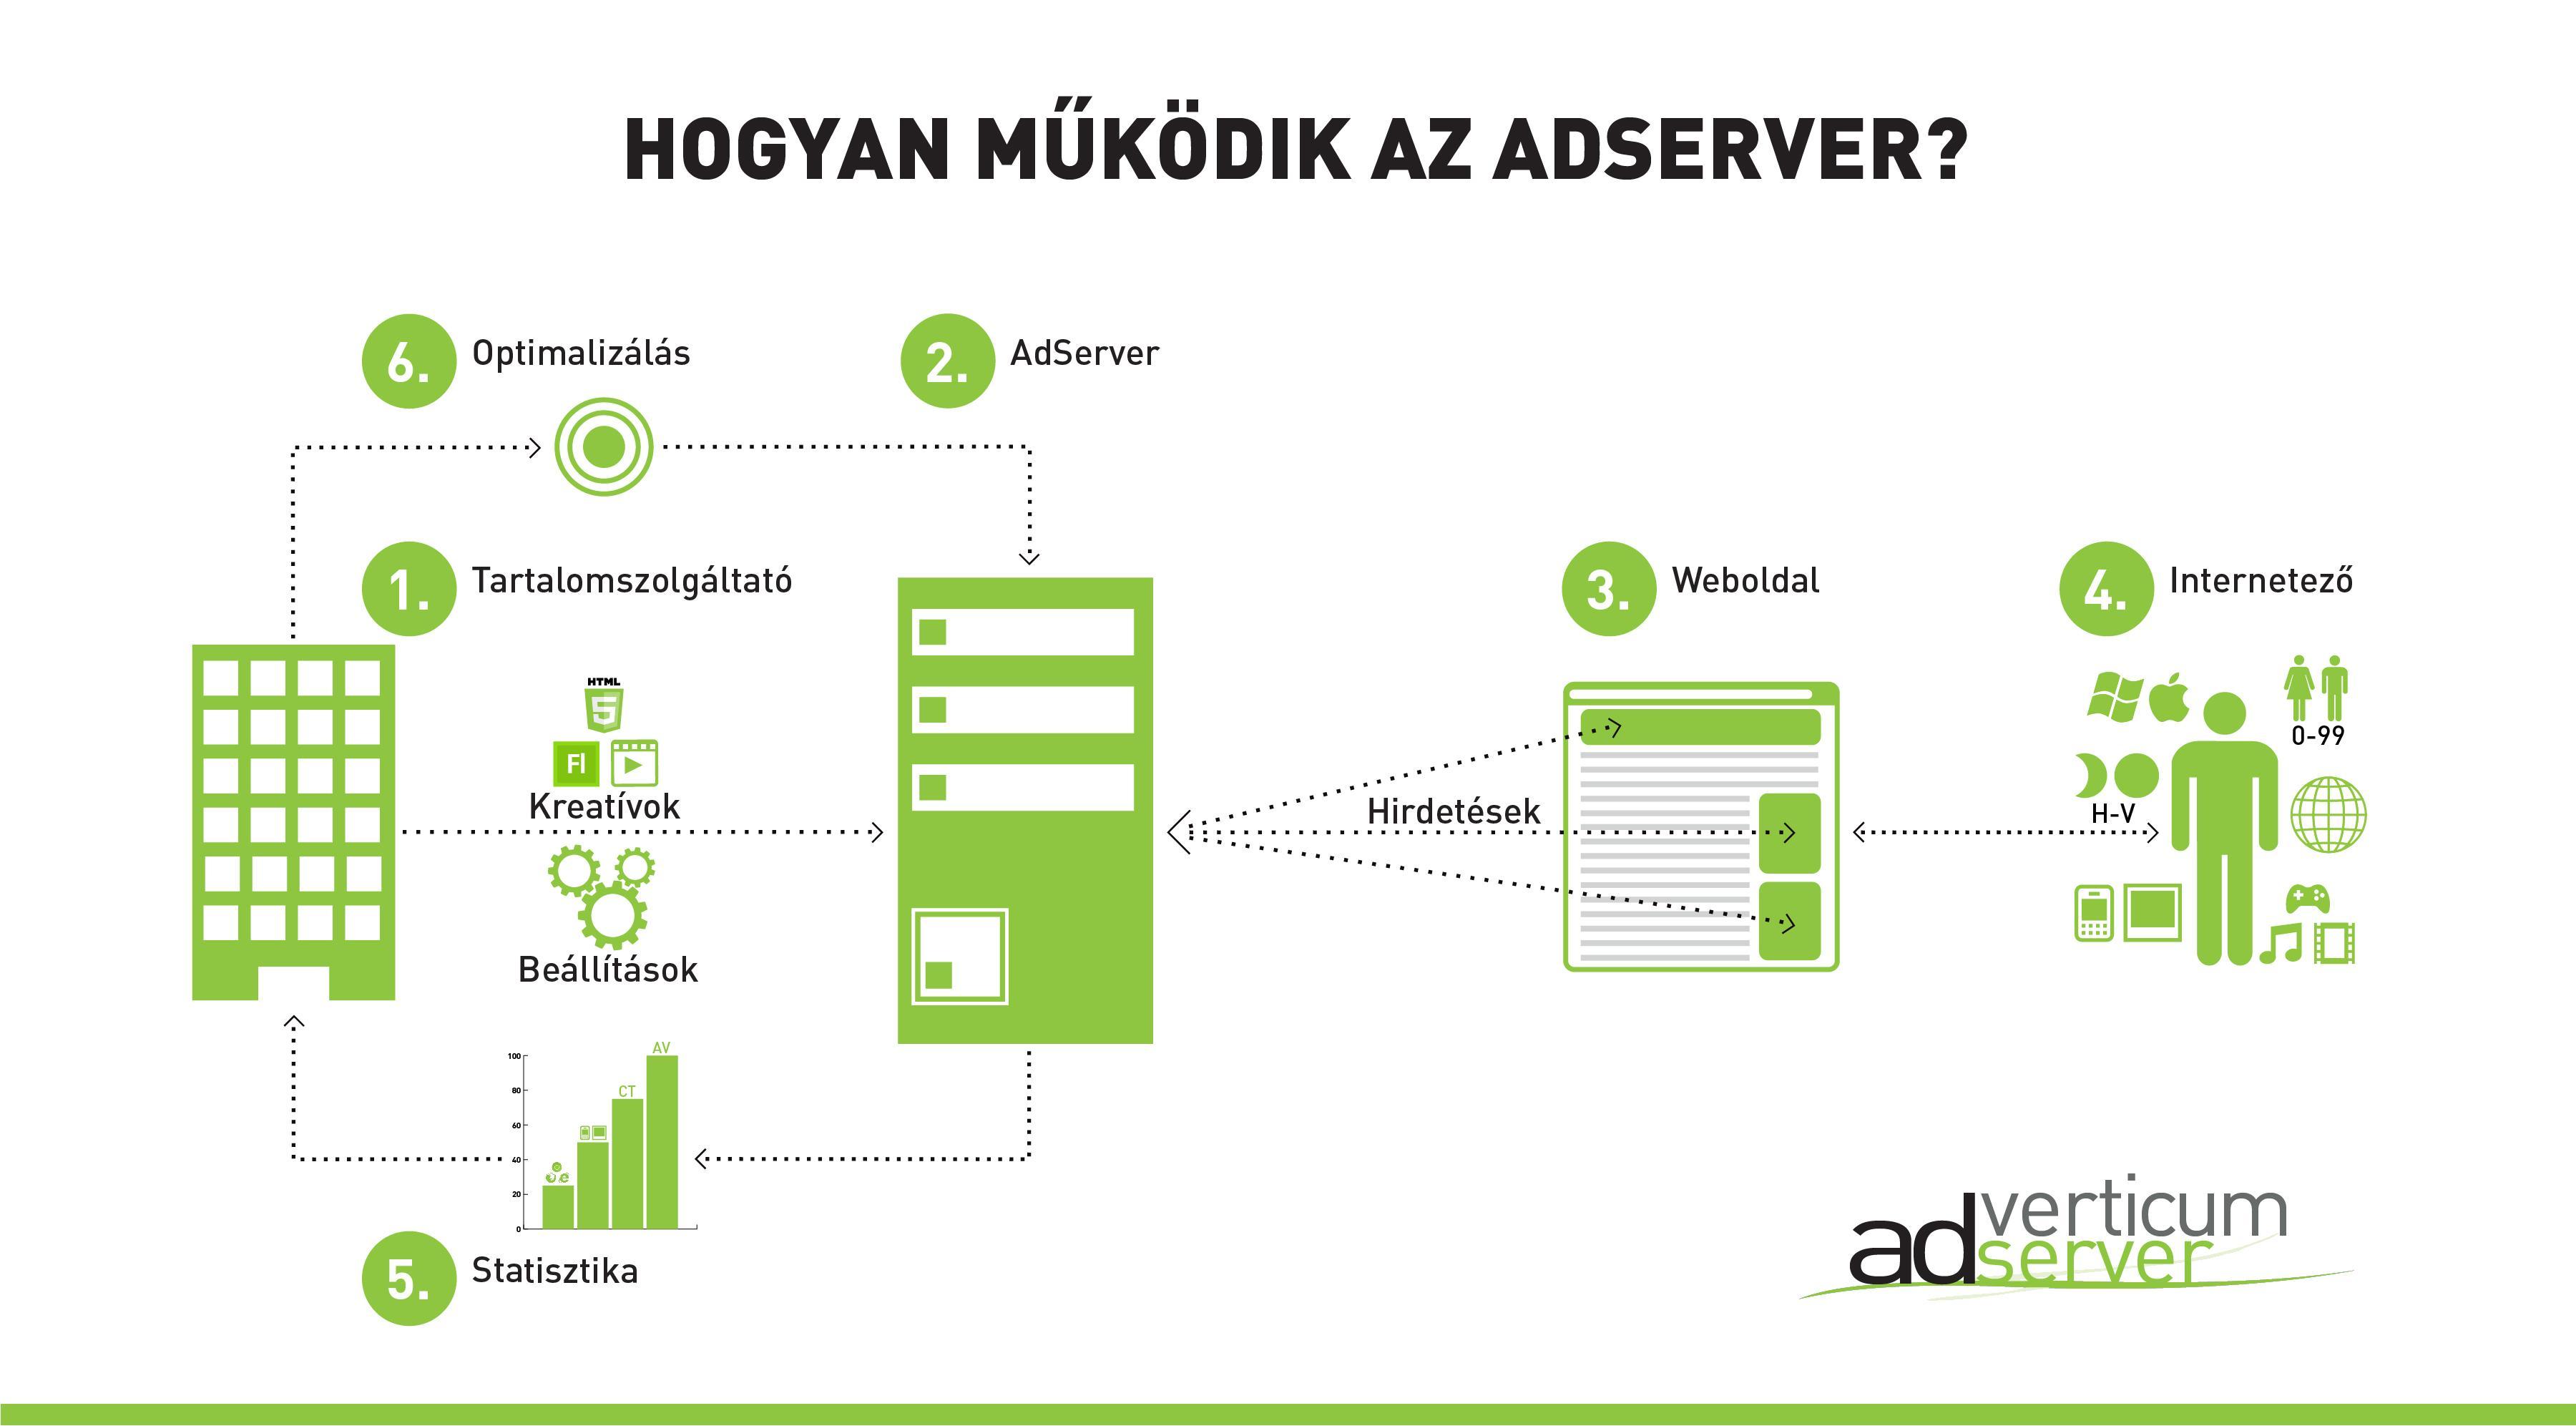 Adserver_Infographic_HU_Final1008.jpg